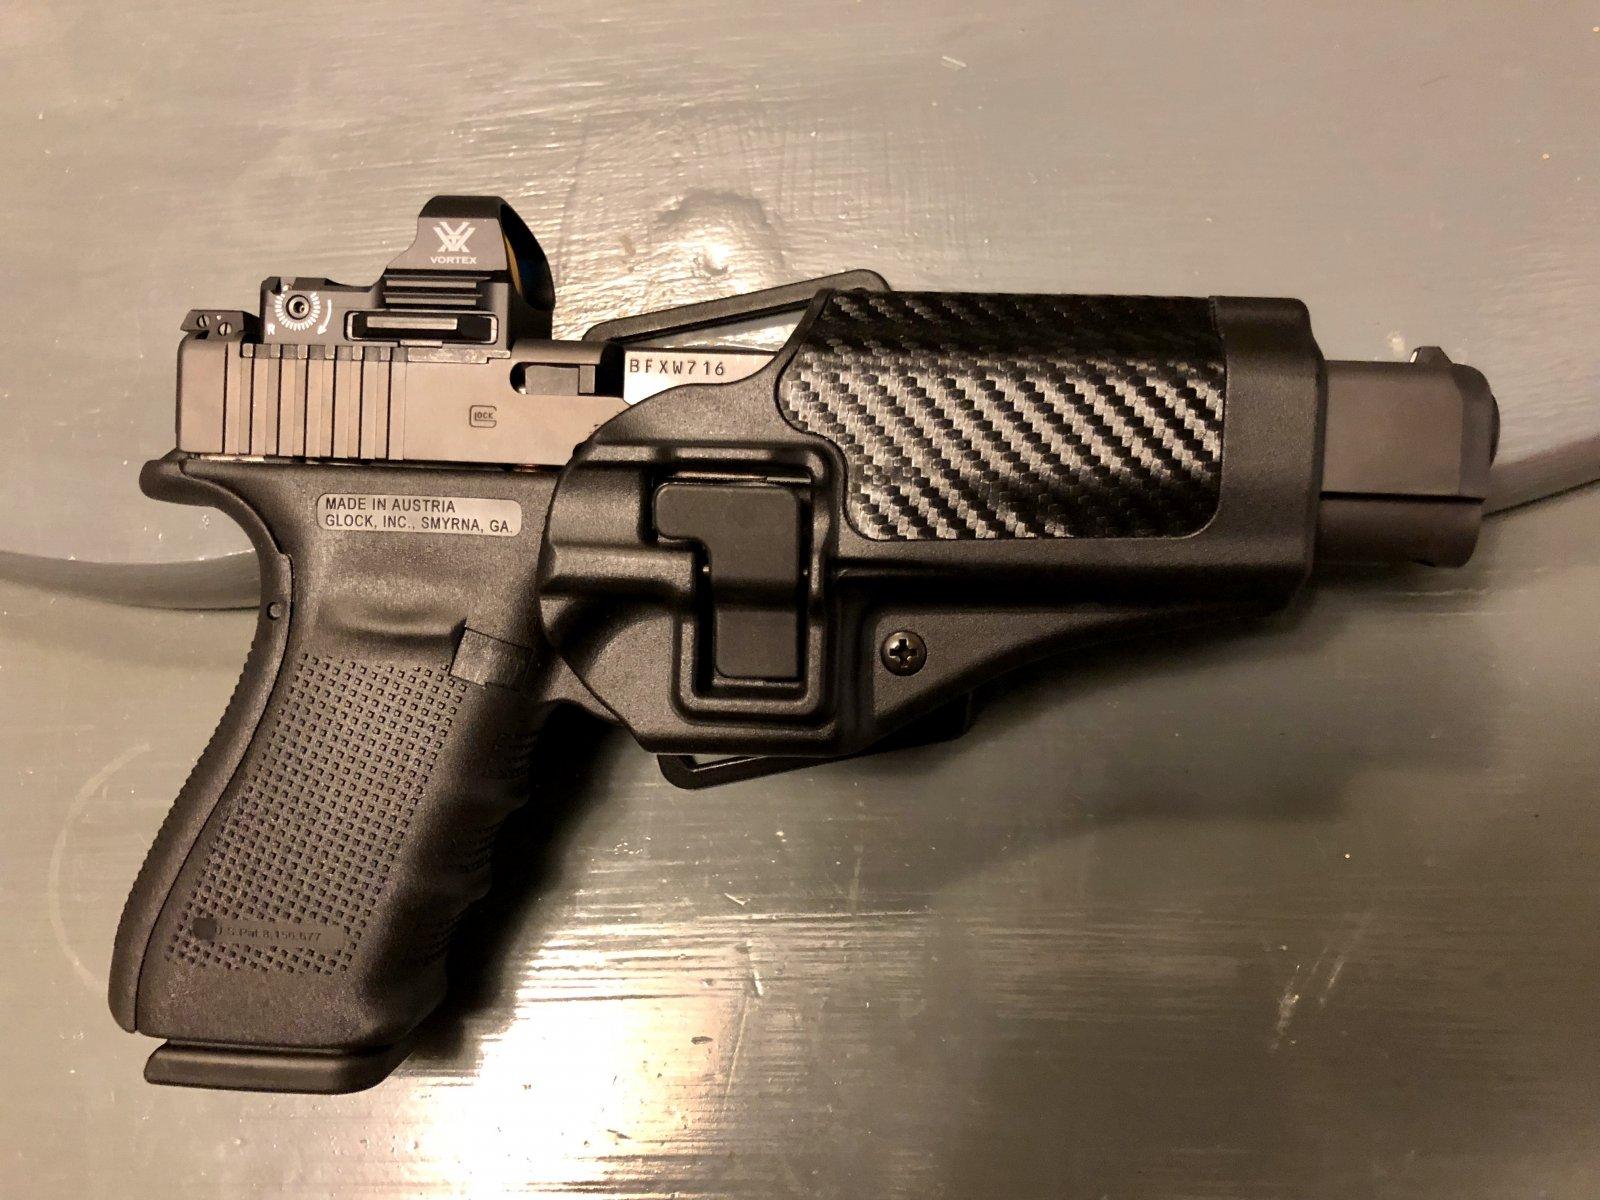 Glock 40 - New G40 10mm w/Vortex Razor | The Leading Glock Forum and